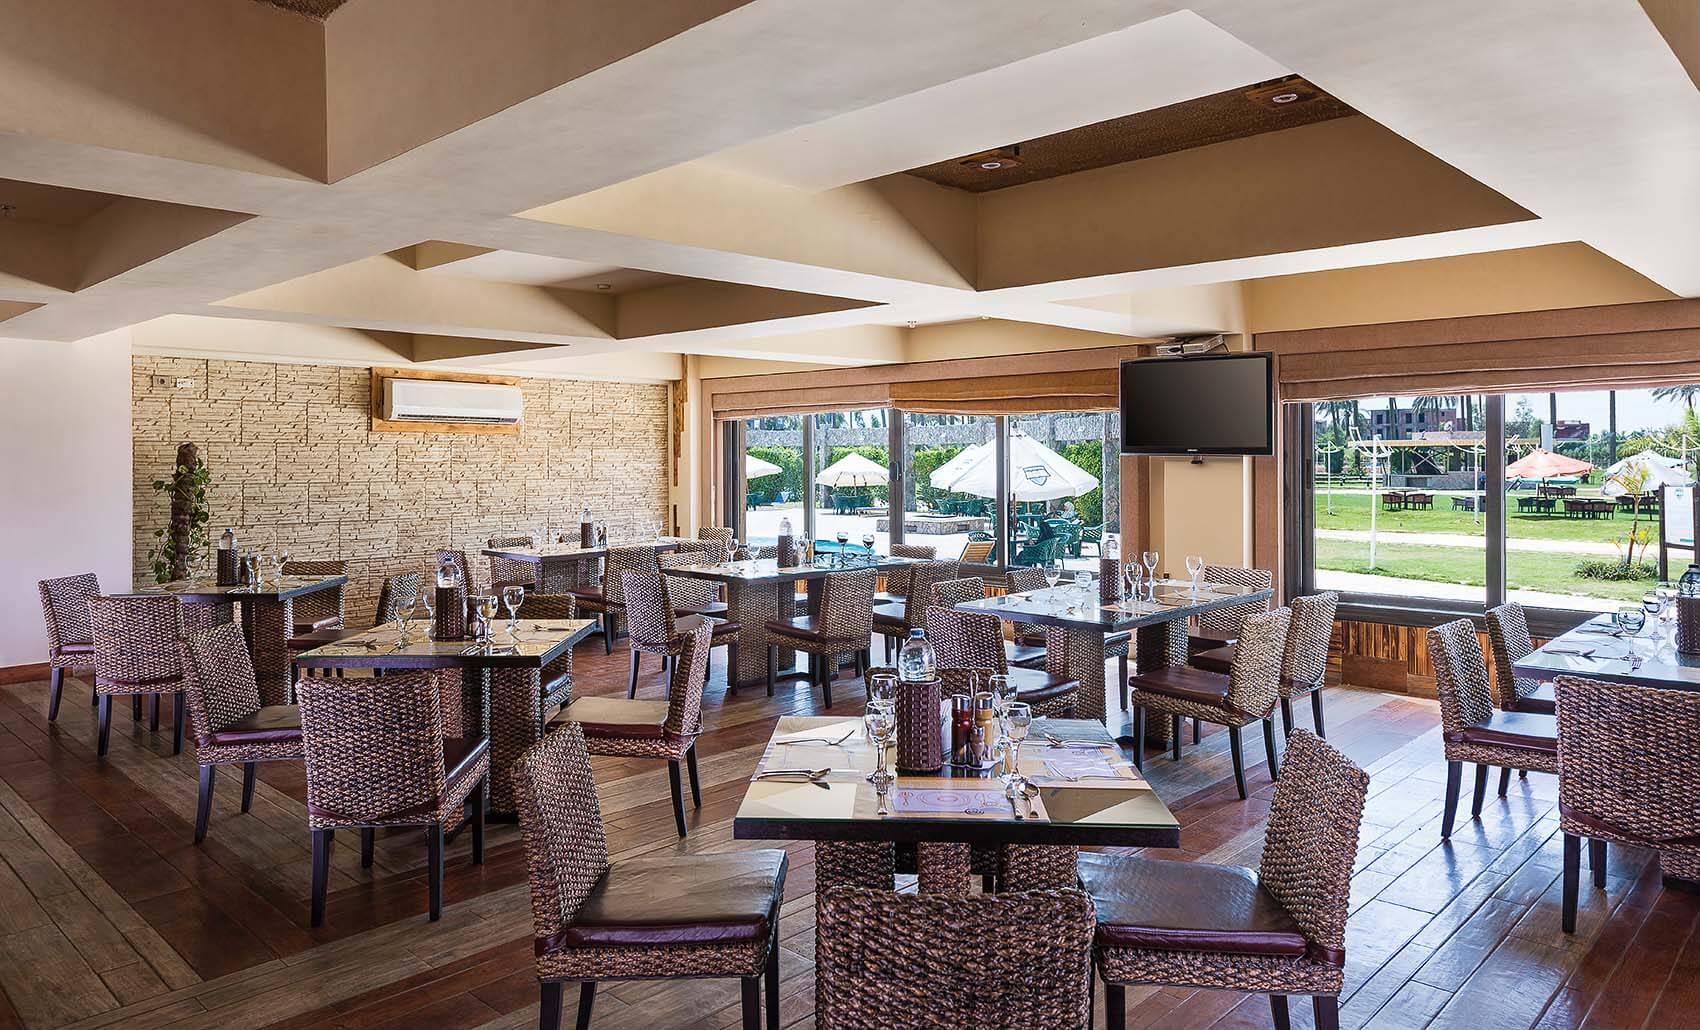 ig-rcr-restaurantinteriors-mohamedabdulhady-com